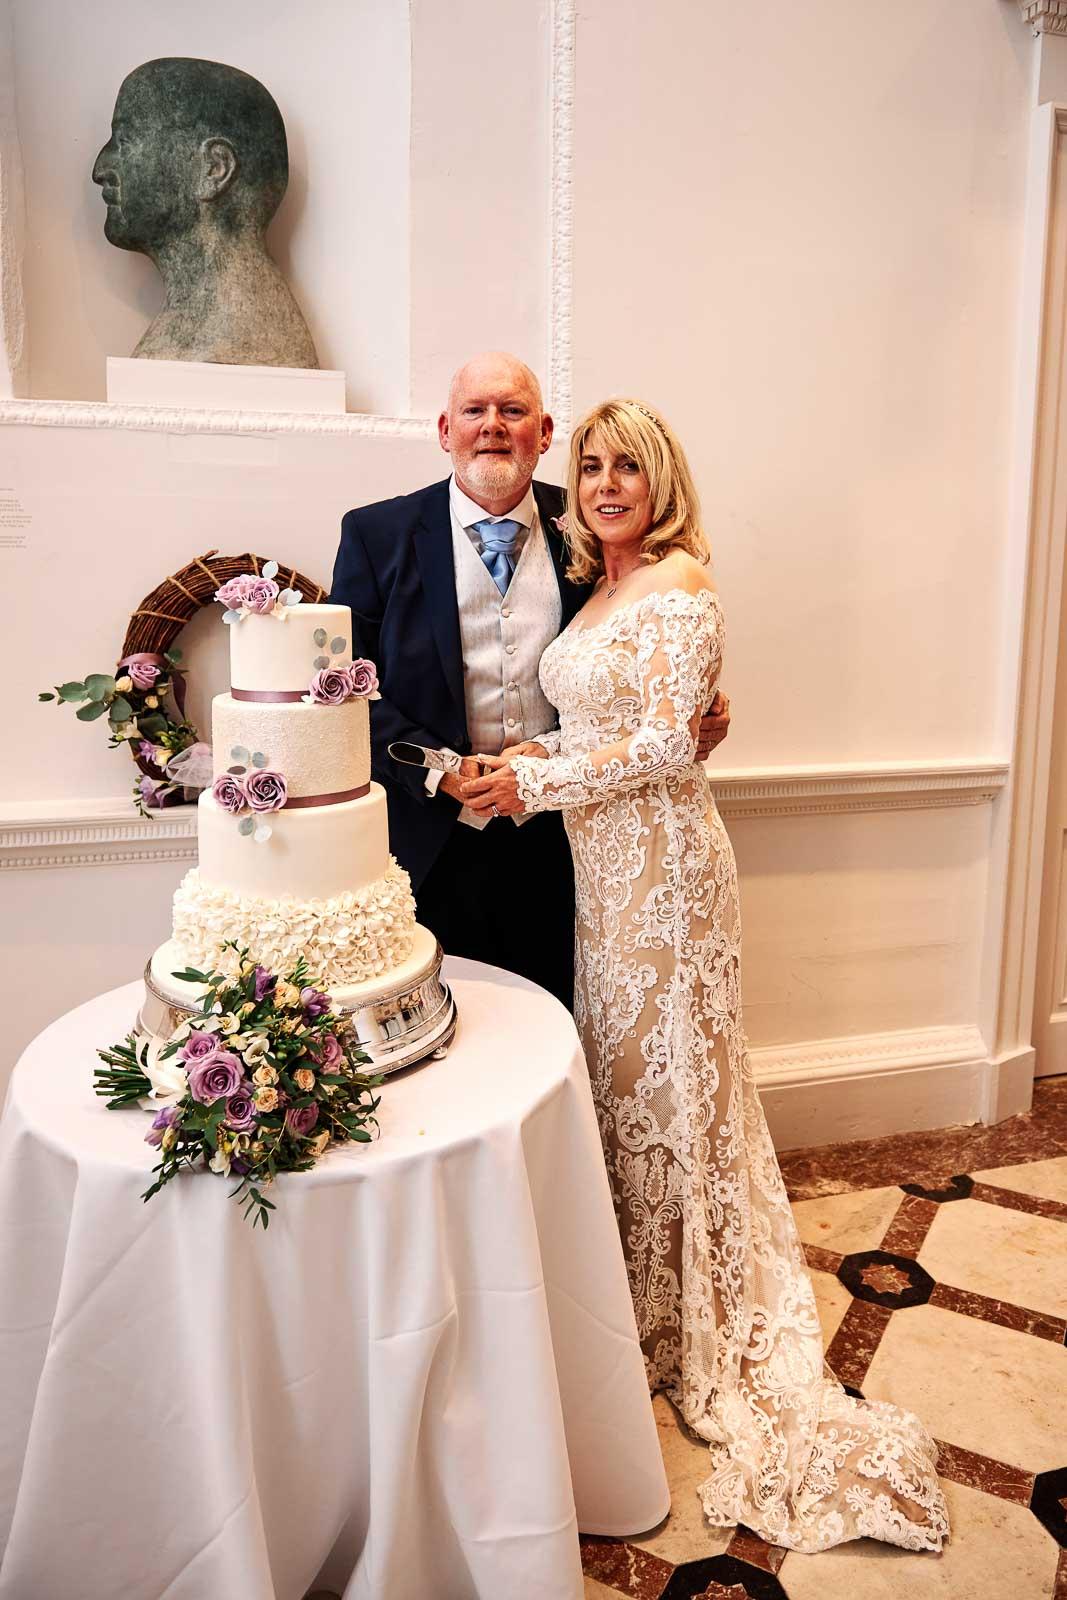 Compton Verney Warwickshire Wedding Photographer Chris Fossey Photography Tracey David